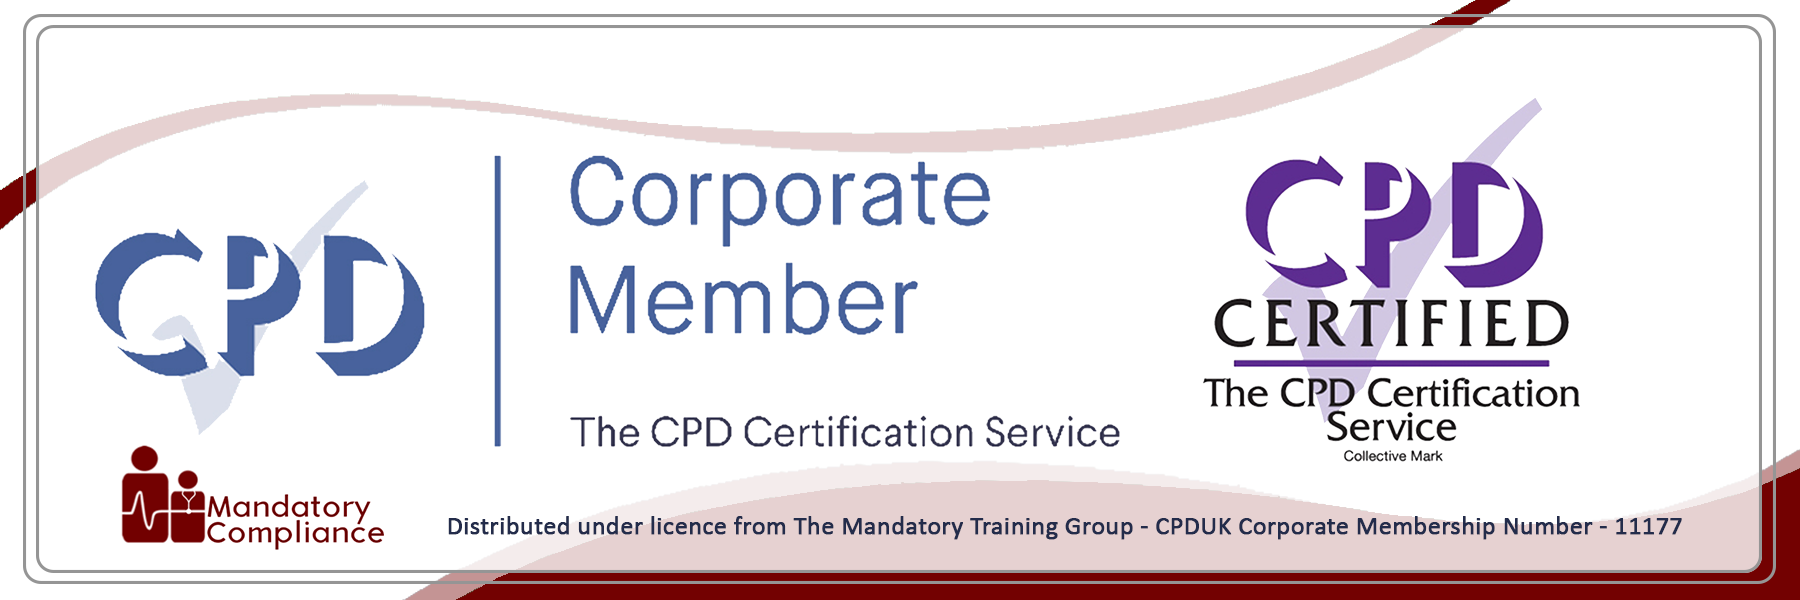 Mastering Microsoft Word 2019 - Basics - Online Course - Mandatory Compliance UK -